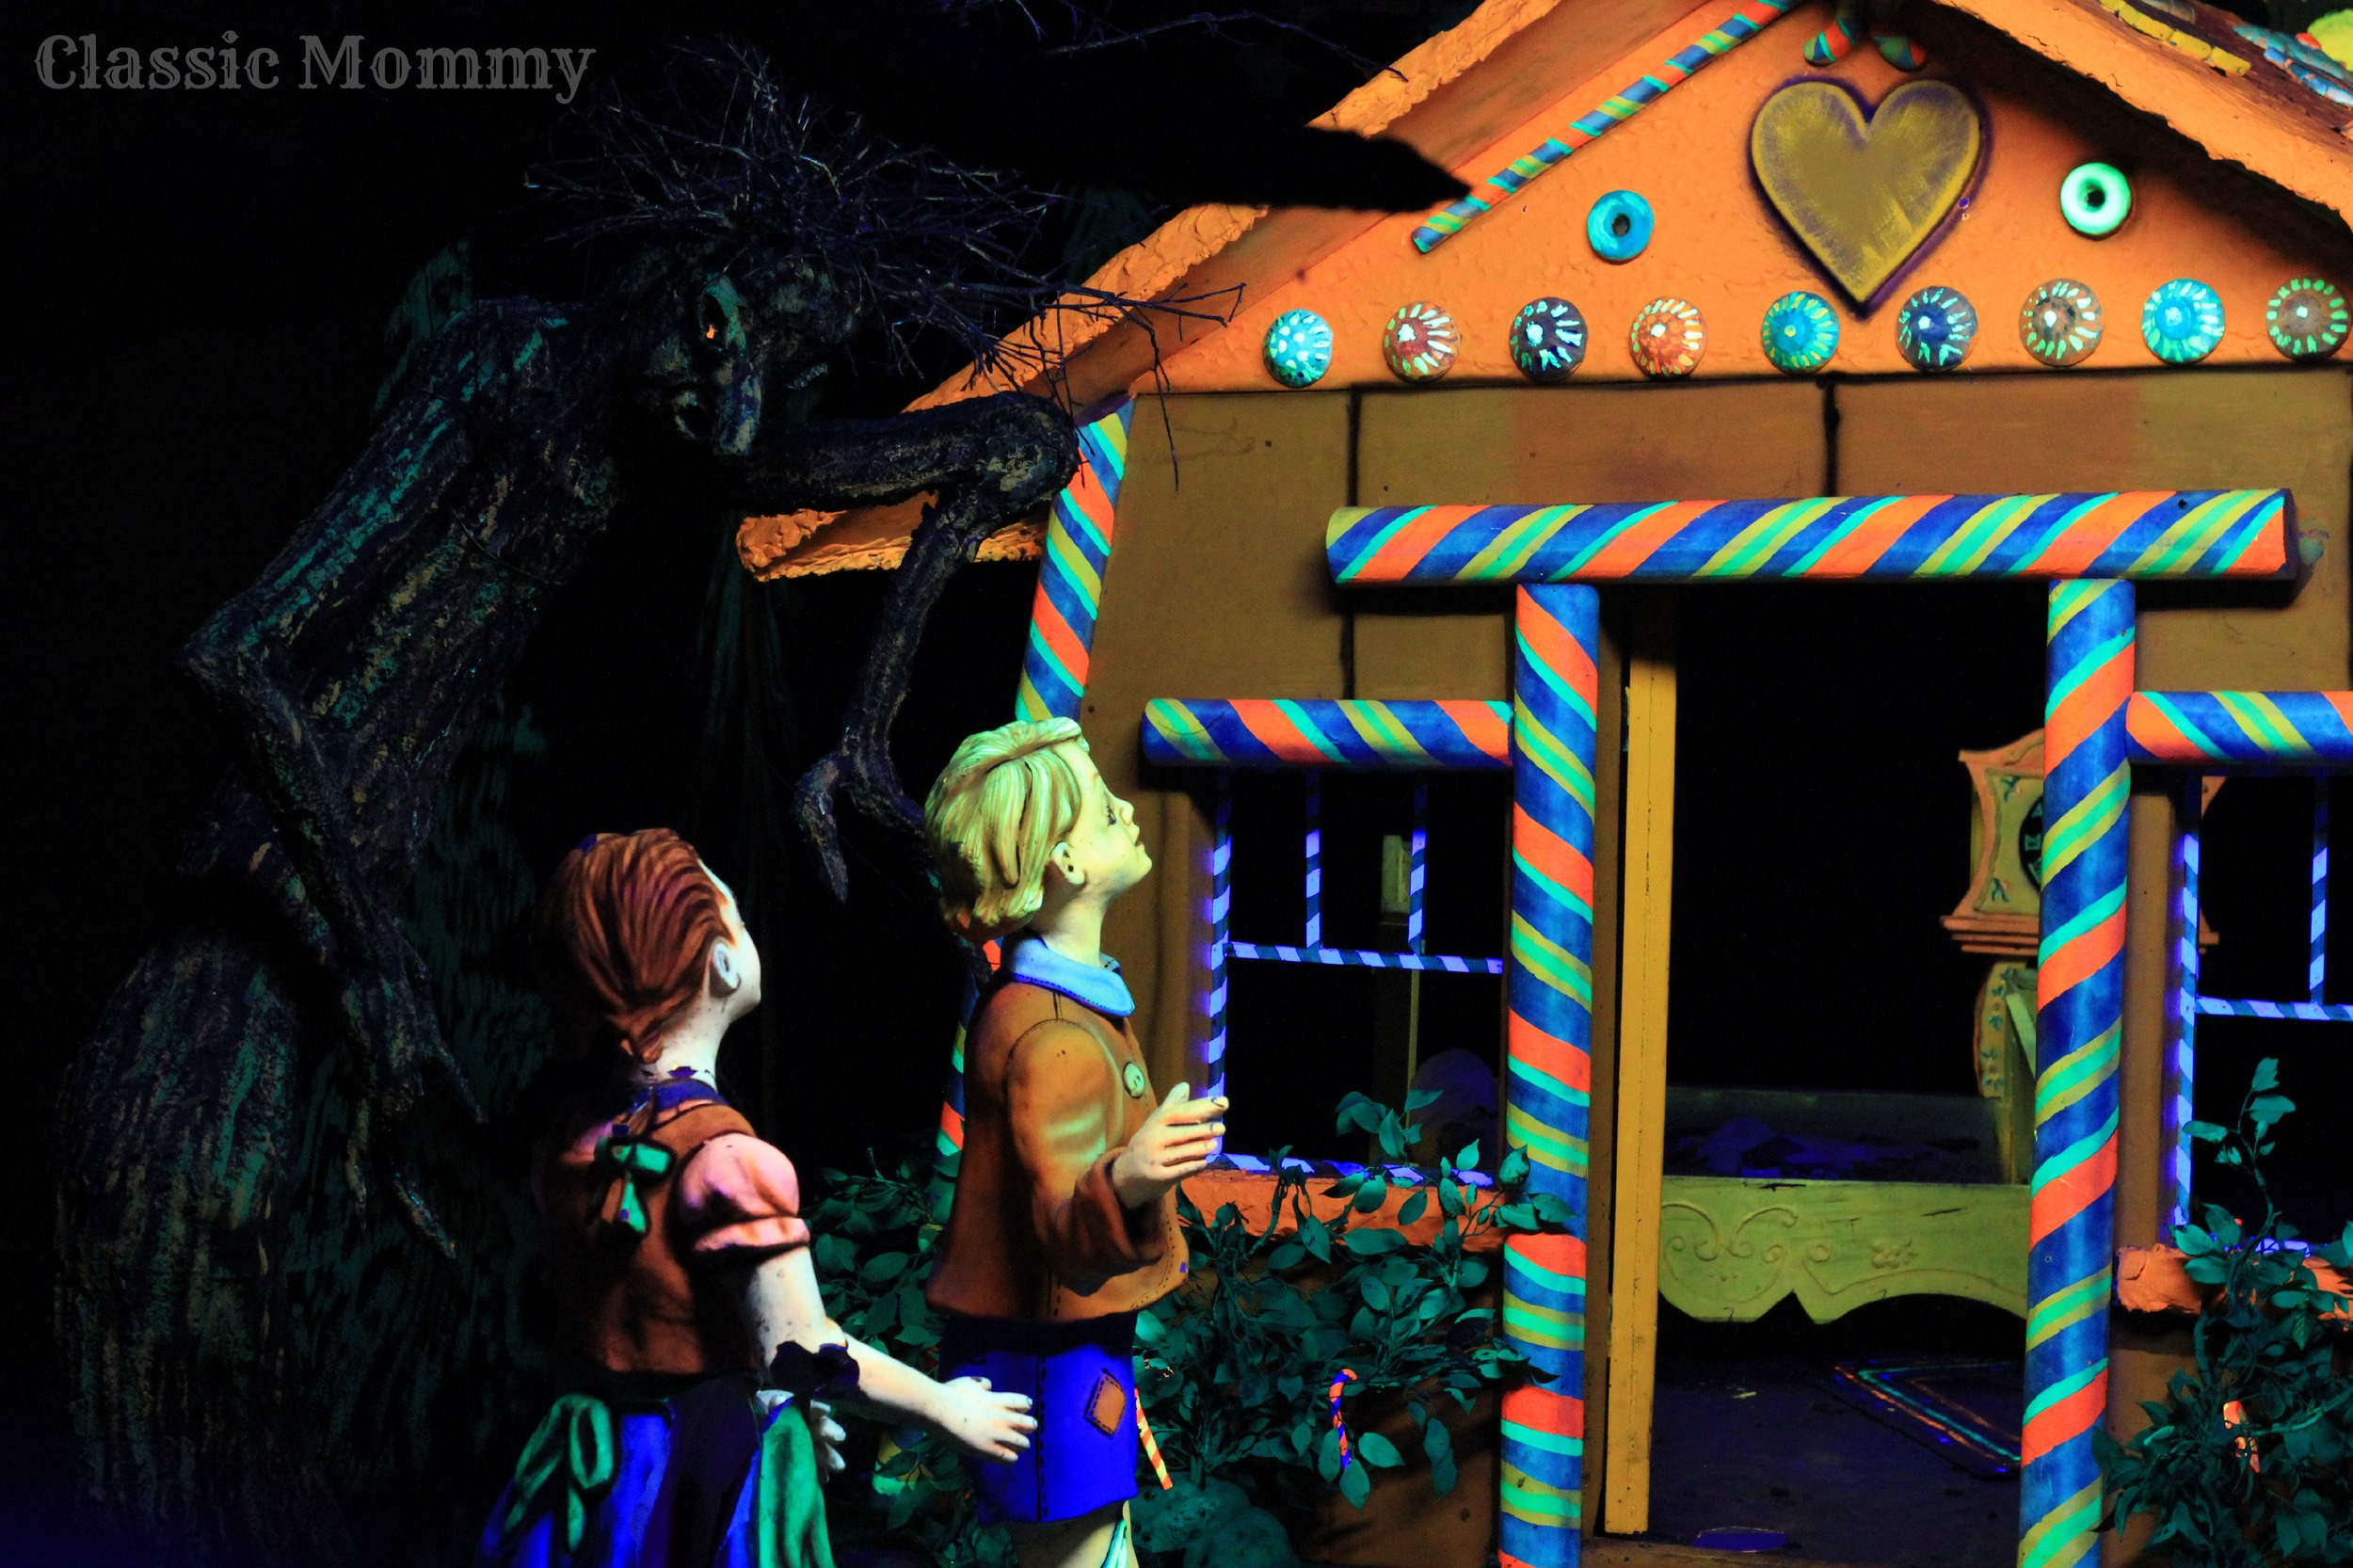 Inside Fairytale Cavern Rock City